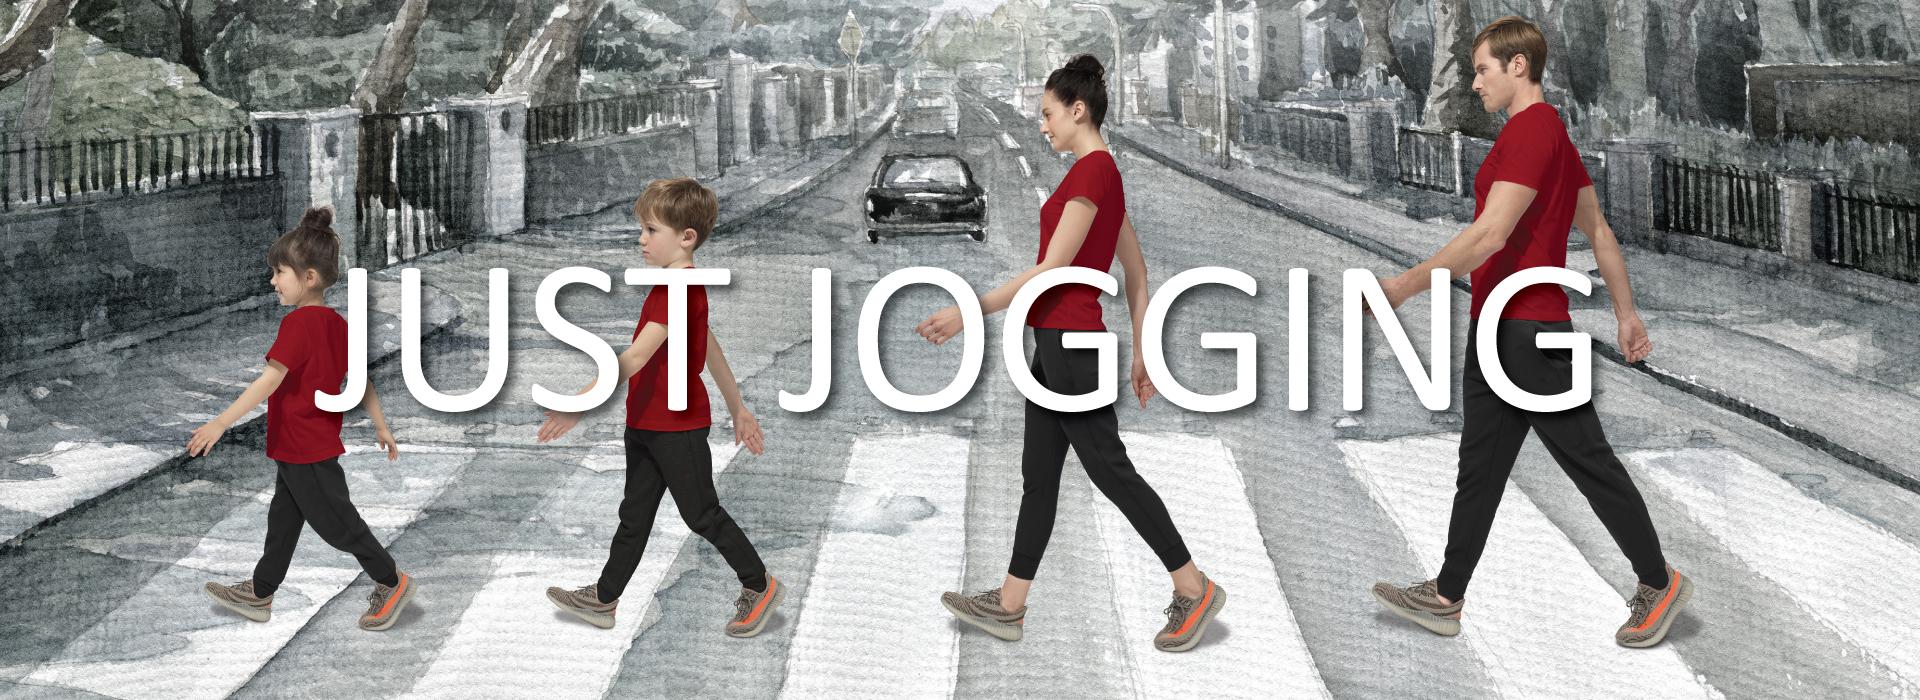 Just jogging